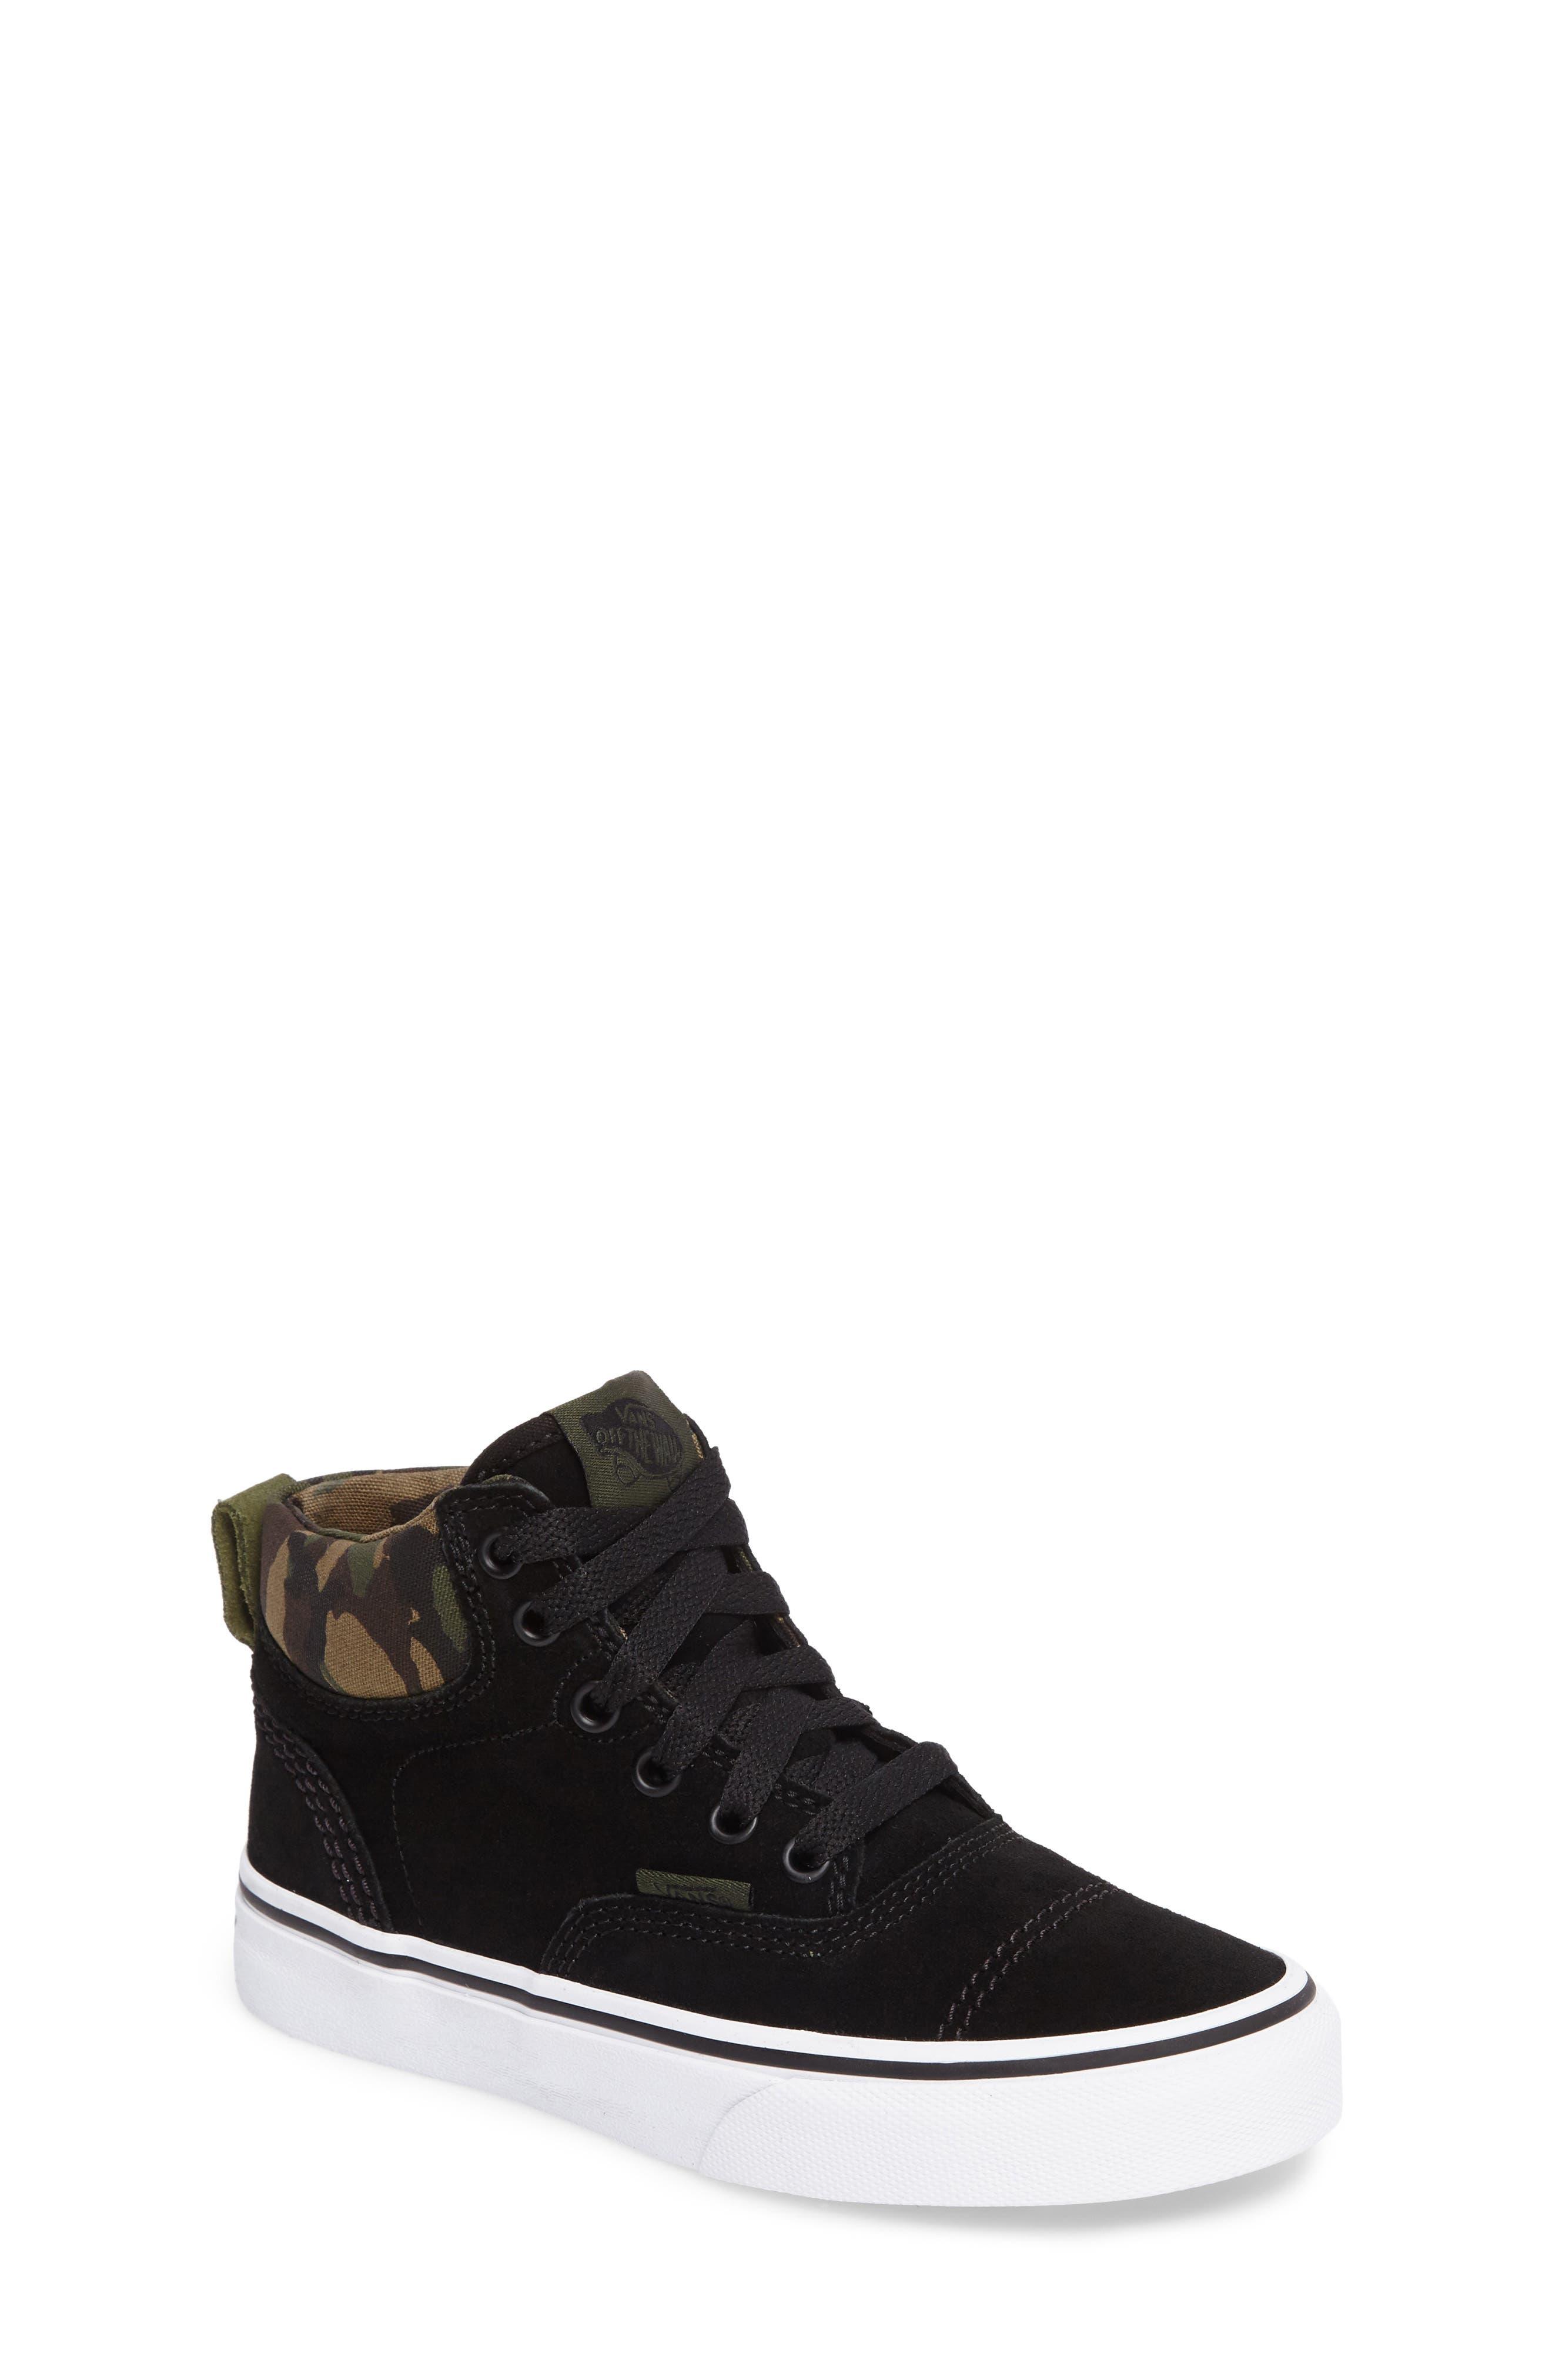 Era - Hi Sneaker,                         Main,                         color, Classic Camo/ Black Suede